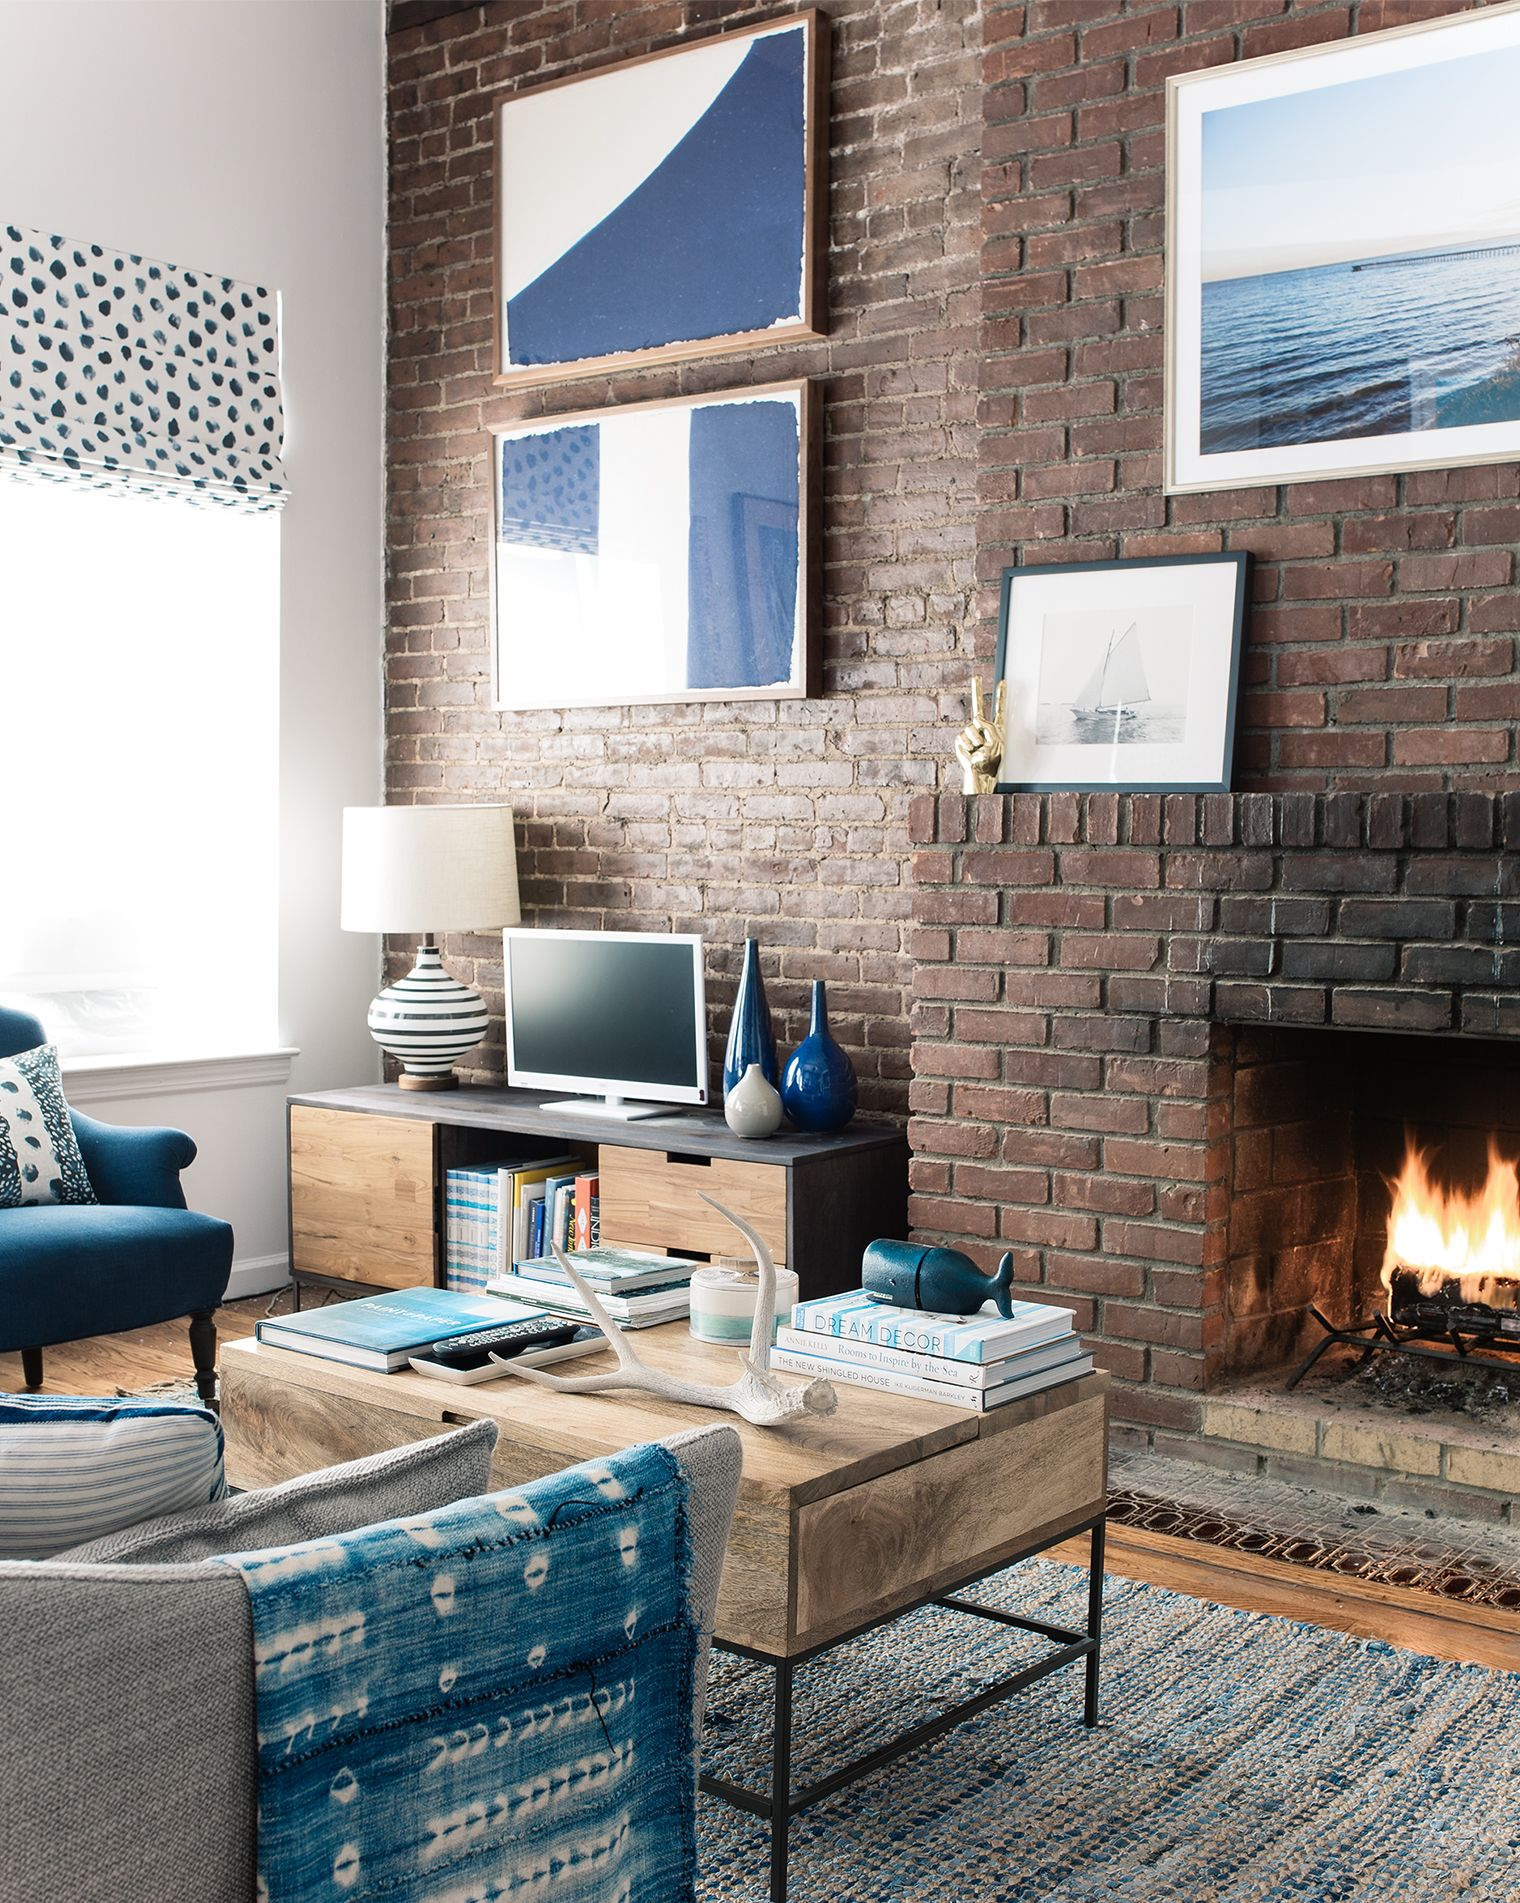 How To Decorate An Nyc Brownstone Apartment Minimalist Living Room Minimalist Bedroom Furniture Interior Design